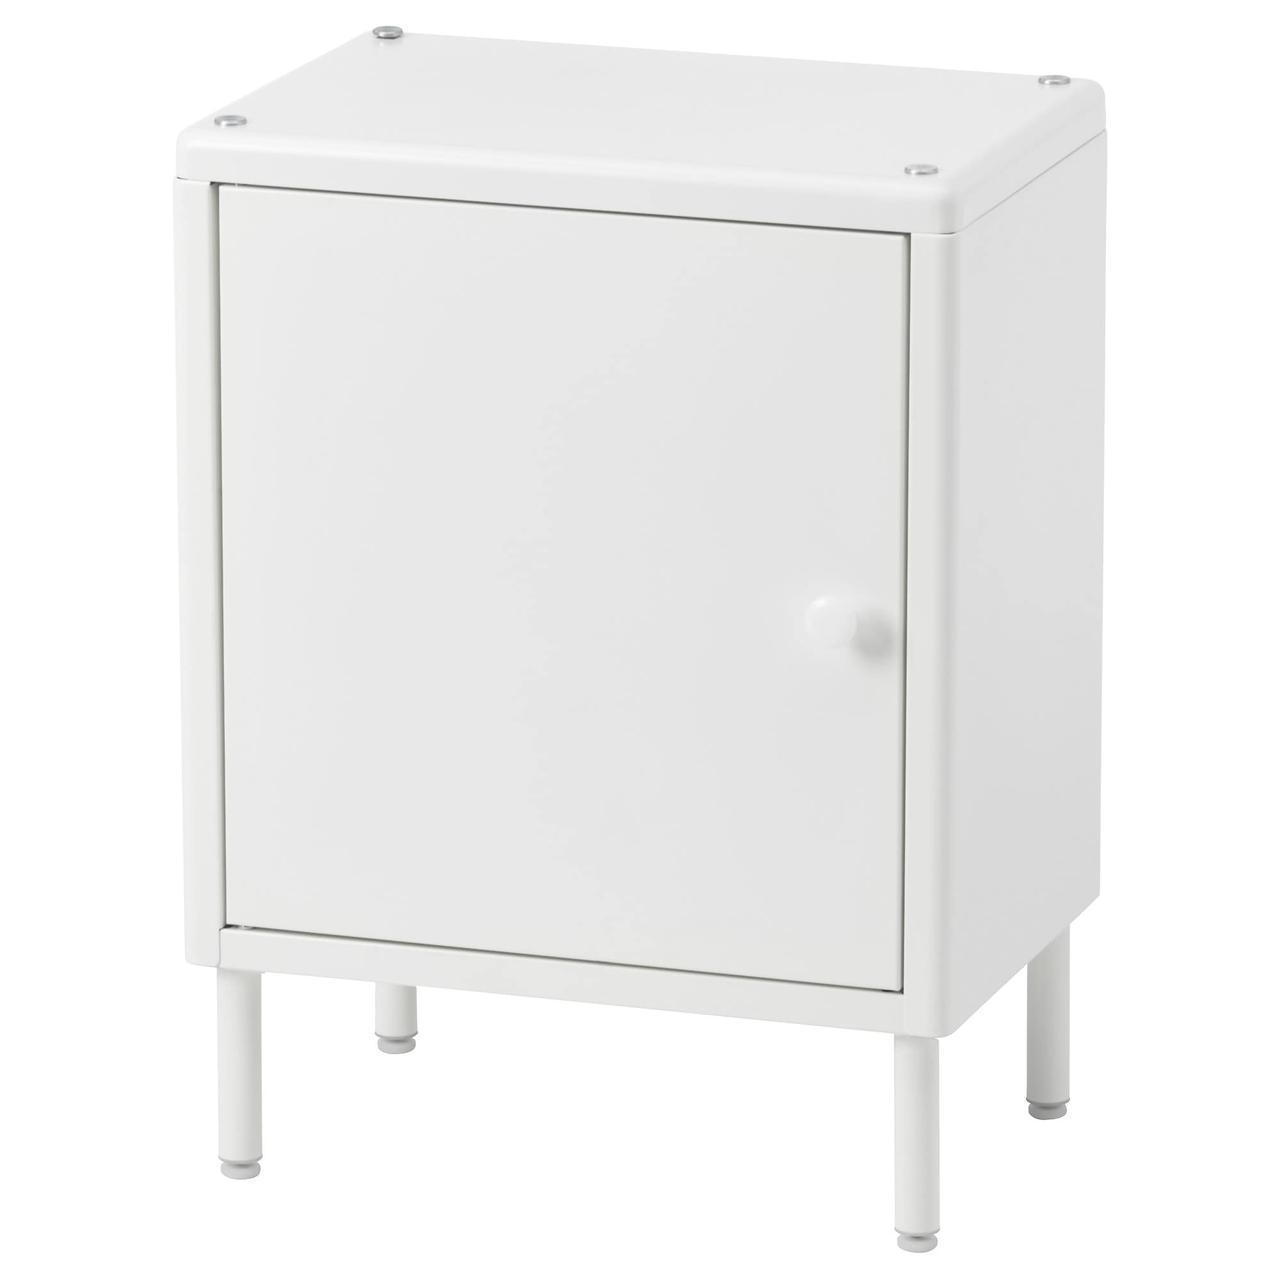 IKEA DYNAN Шкаф с дверями, белый  (503.181.76)